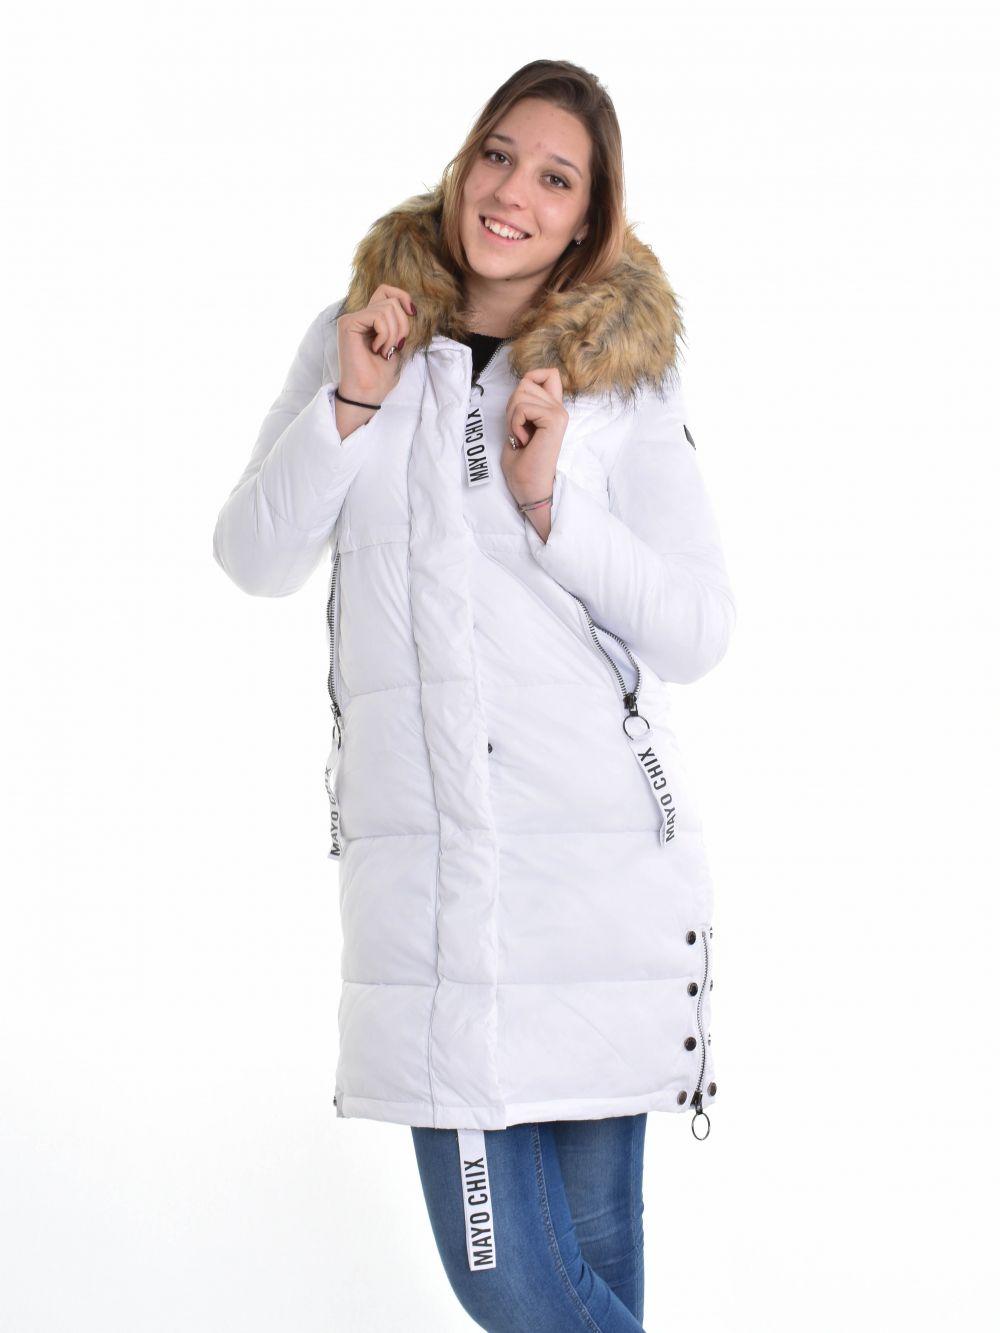 Akciós   Mayo Chix női kabát OSVALDA   Markasbolt.hu